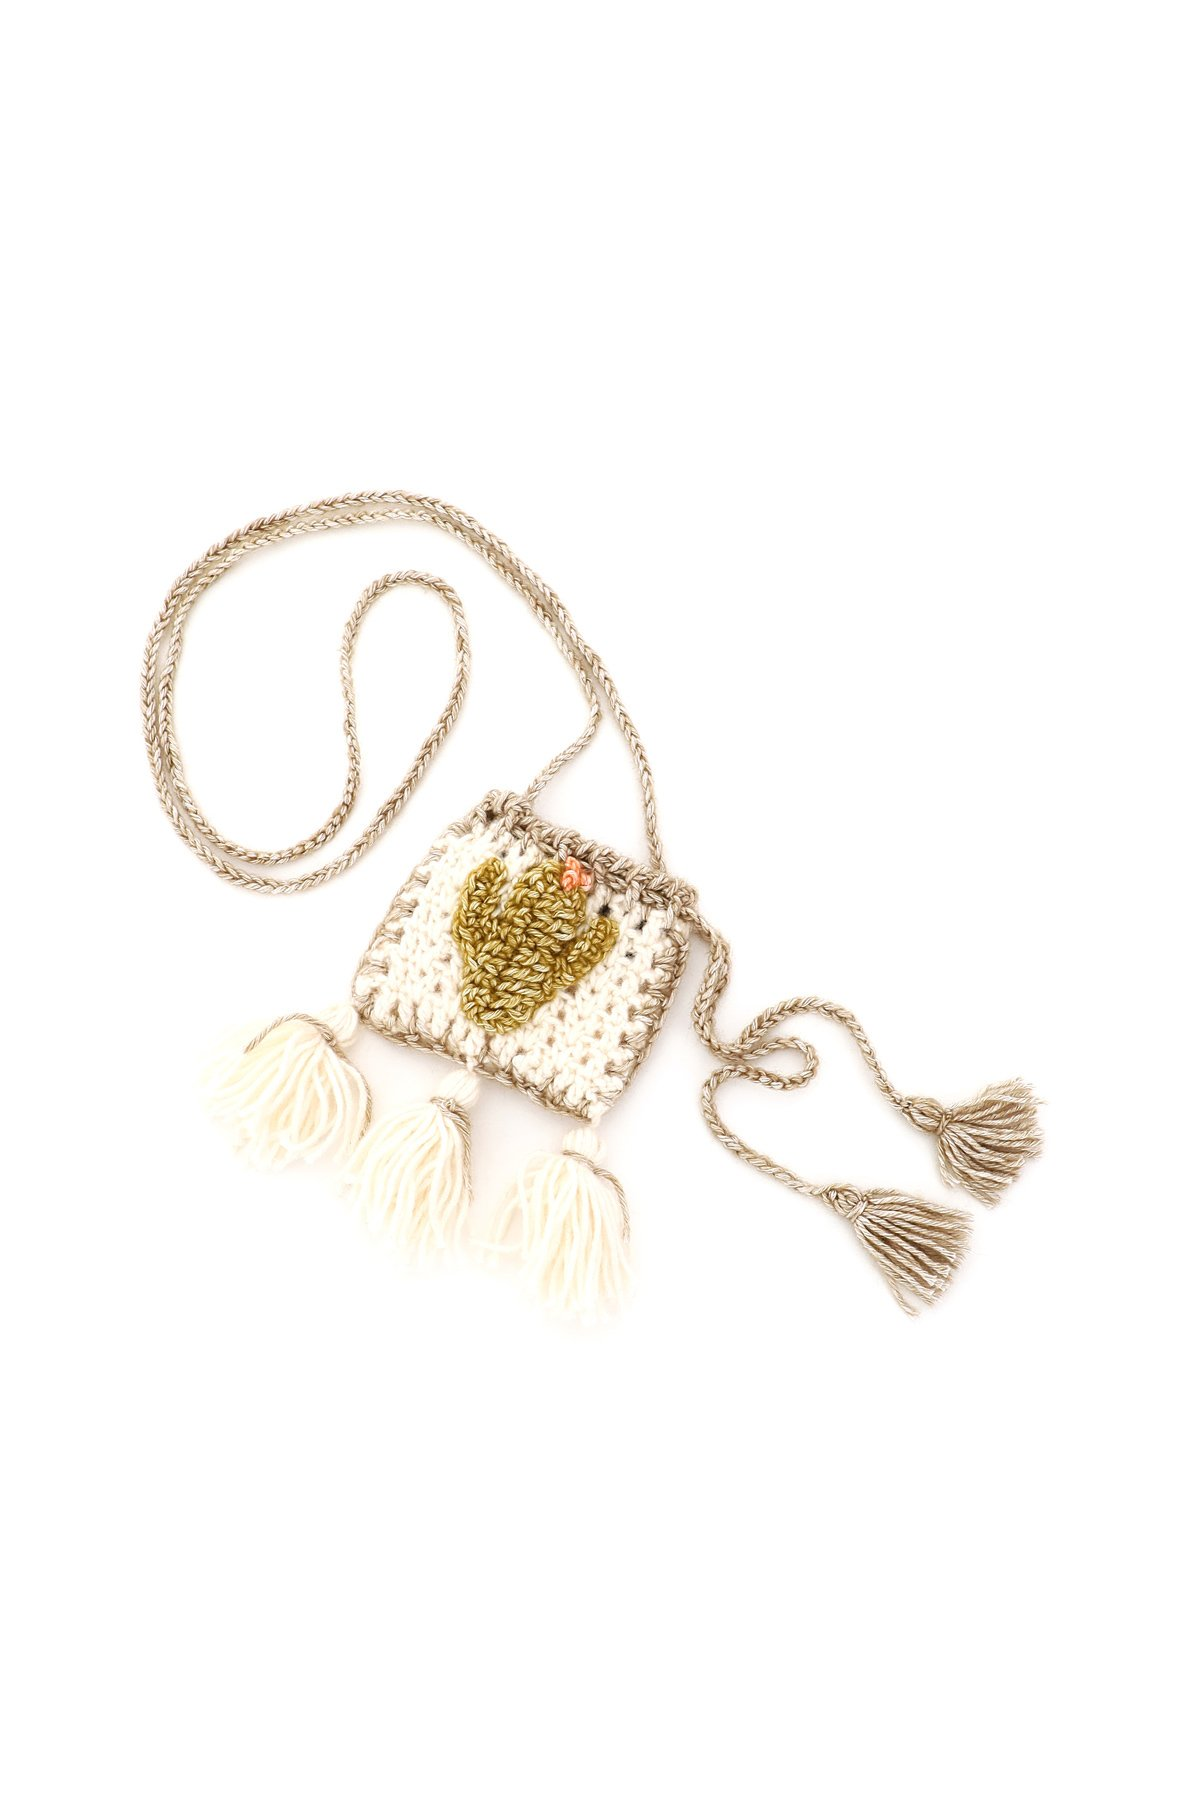 Alanui micro bag per airpods cactus case crochet